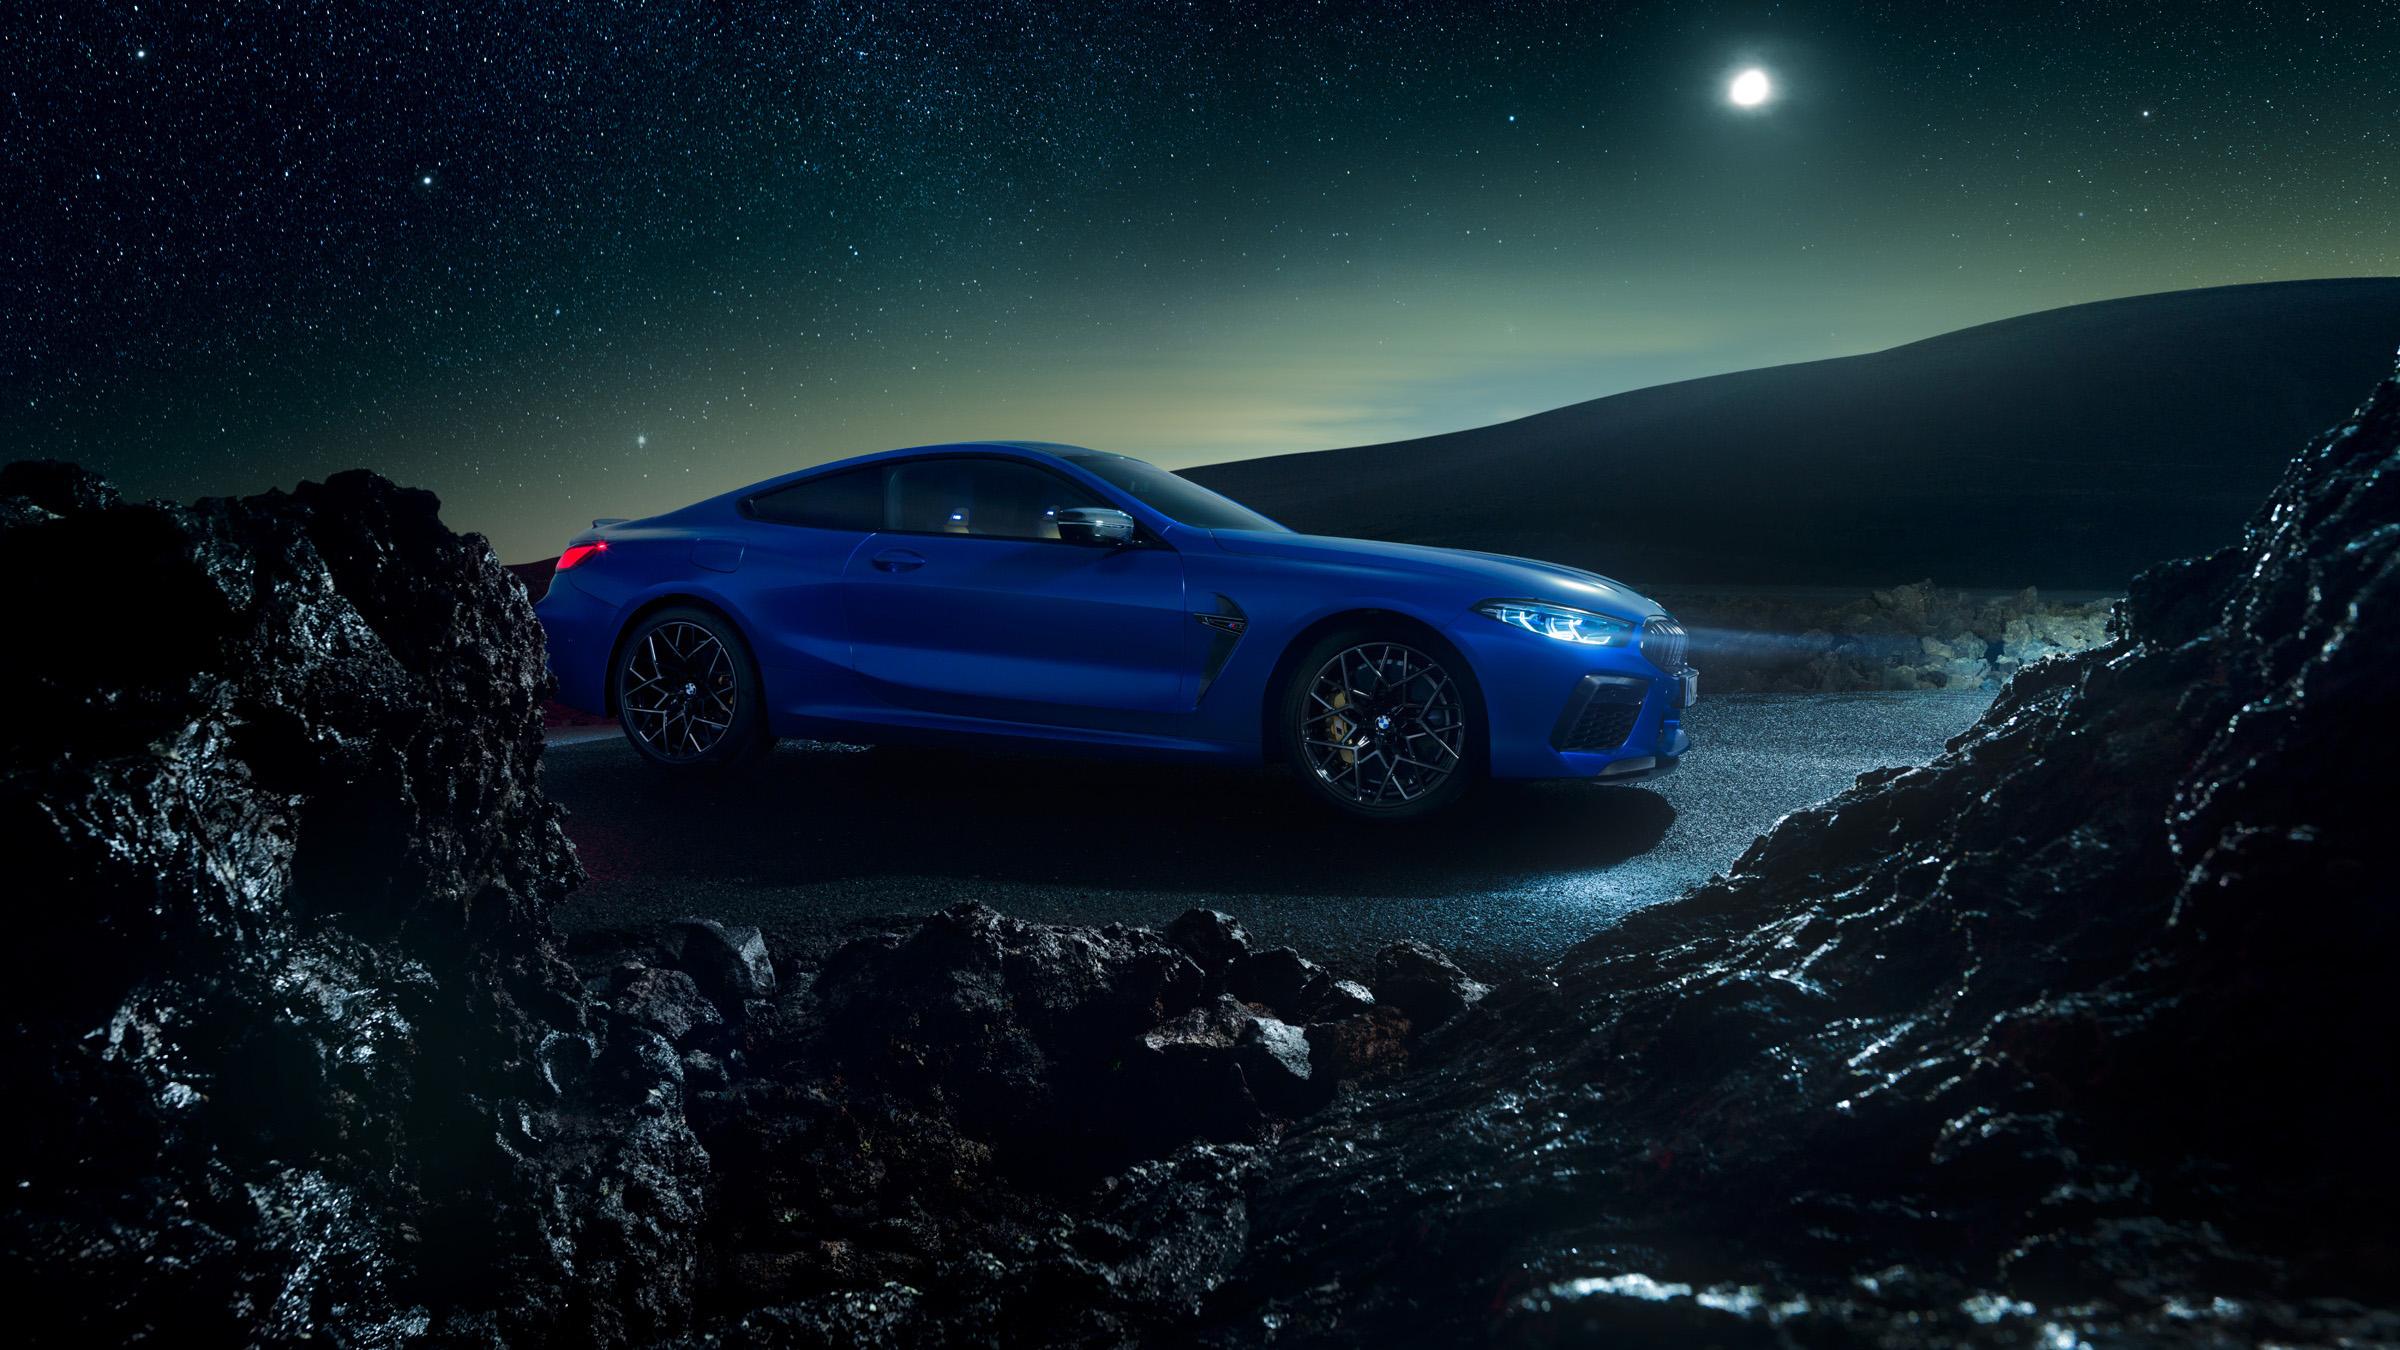 BMW_M8_COUPE_KONRAD_SCHMIDT_06_2400x1350